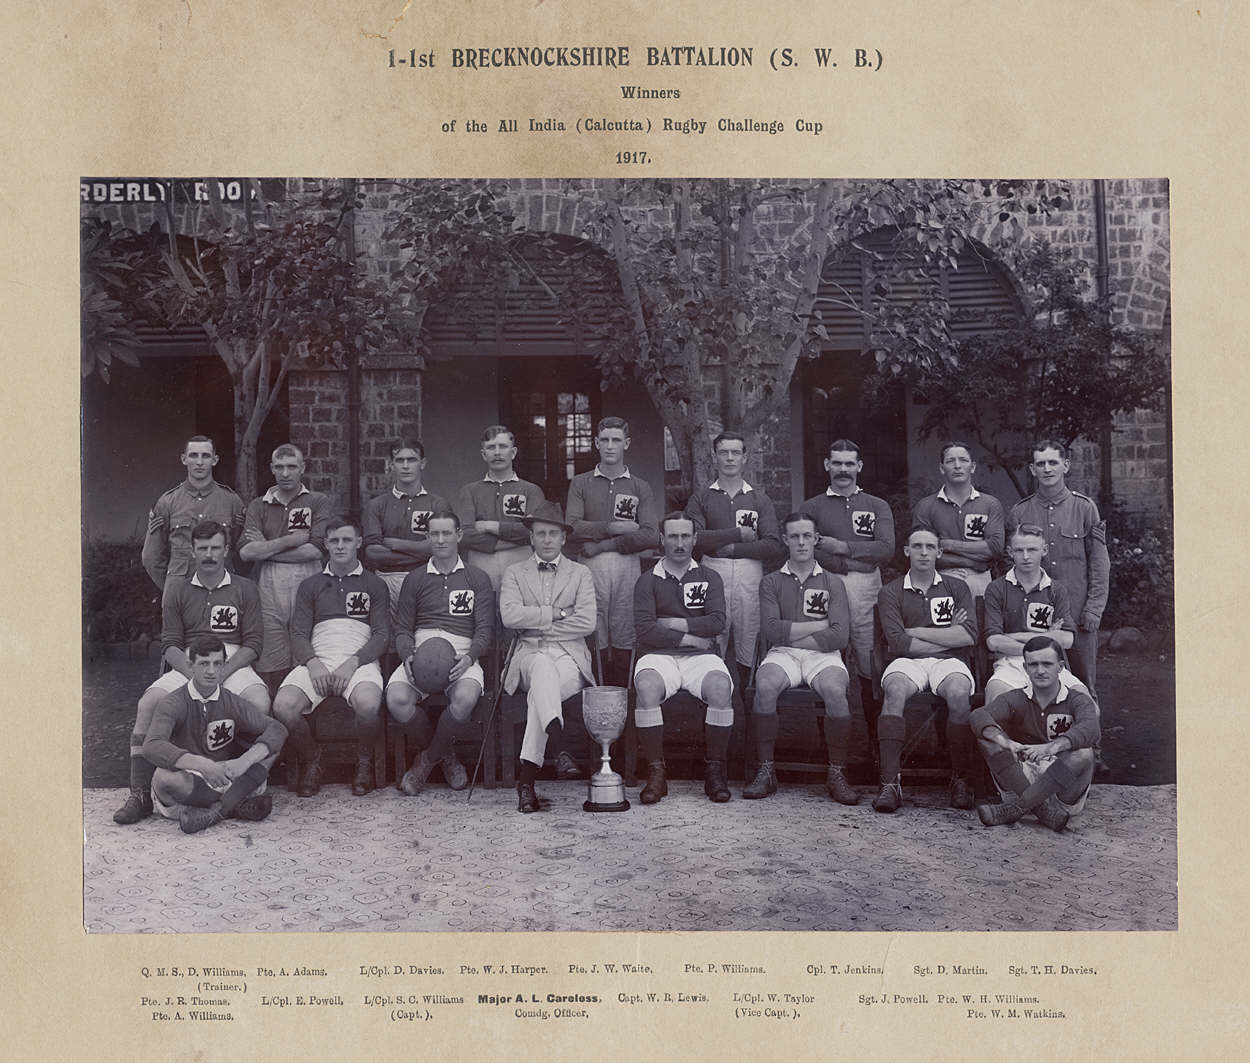 1st Brecknockshire Battalion South Wales Borderers